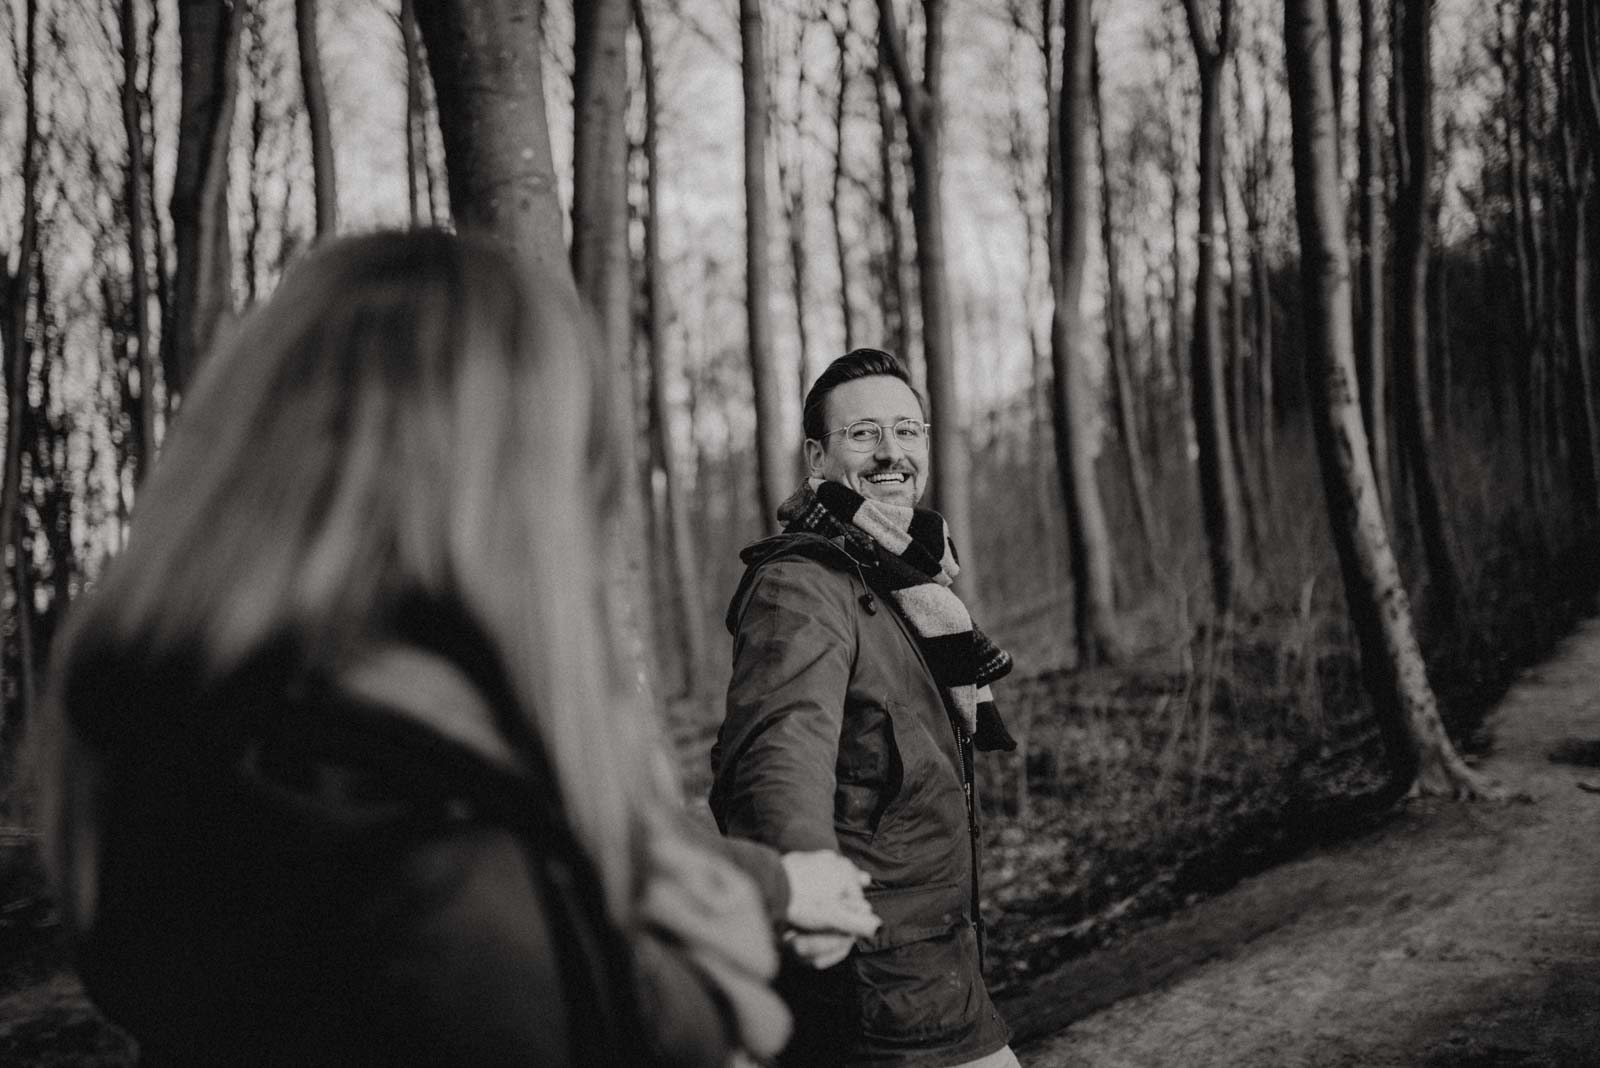 018-Babybauch-Shooting-Wald-Natur-Witten-Familienfotografie-Familienfotos